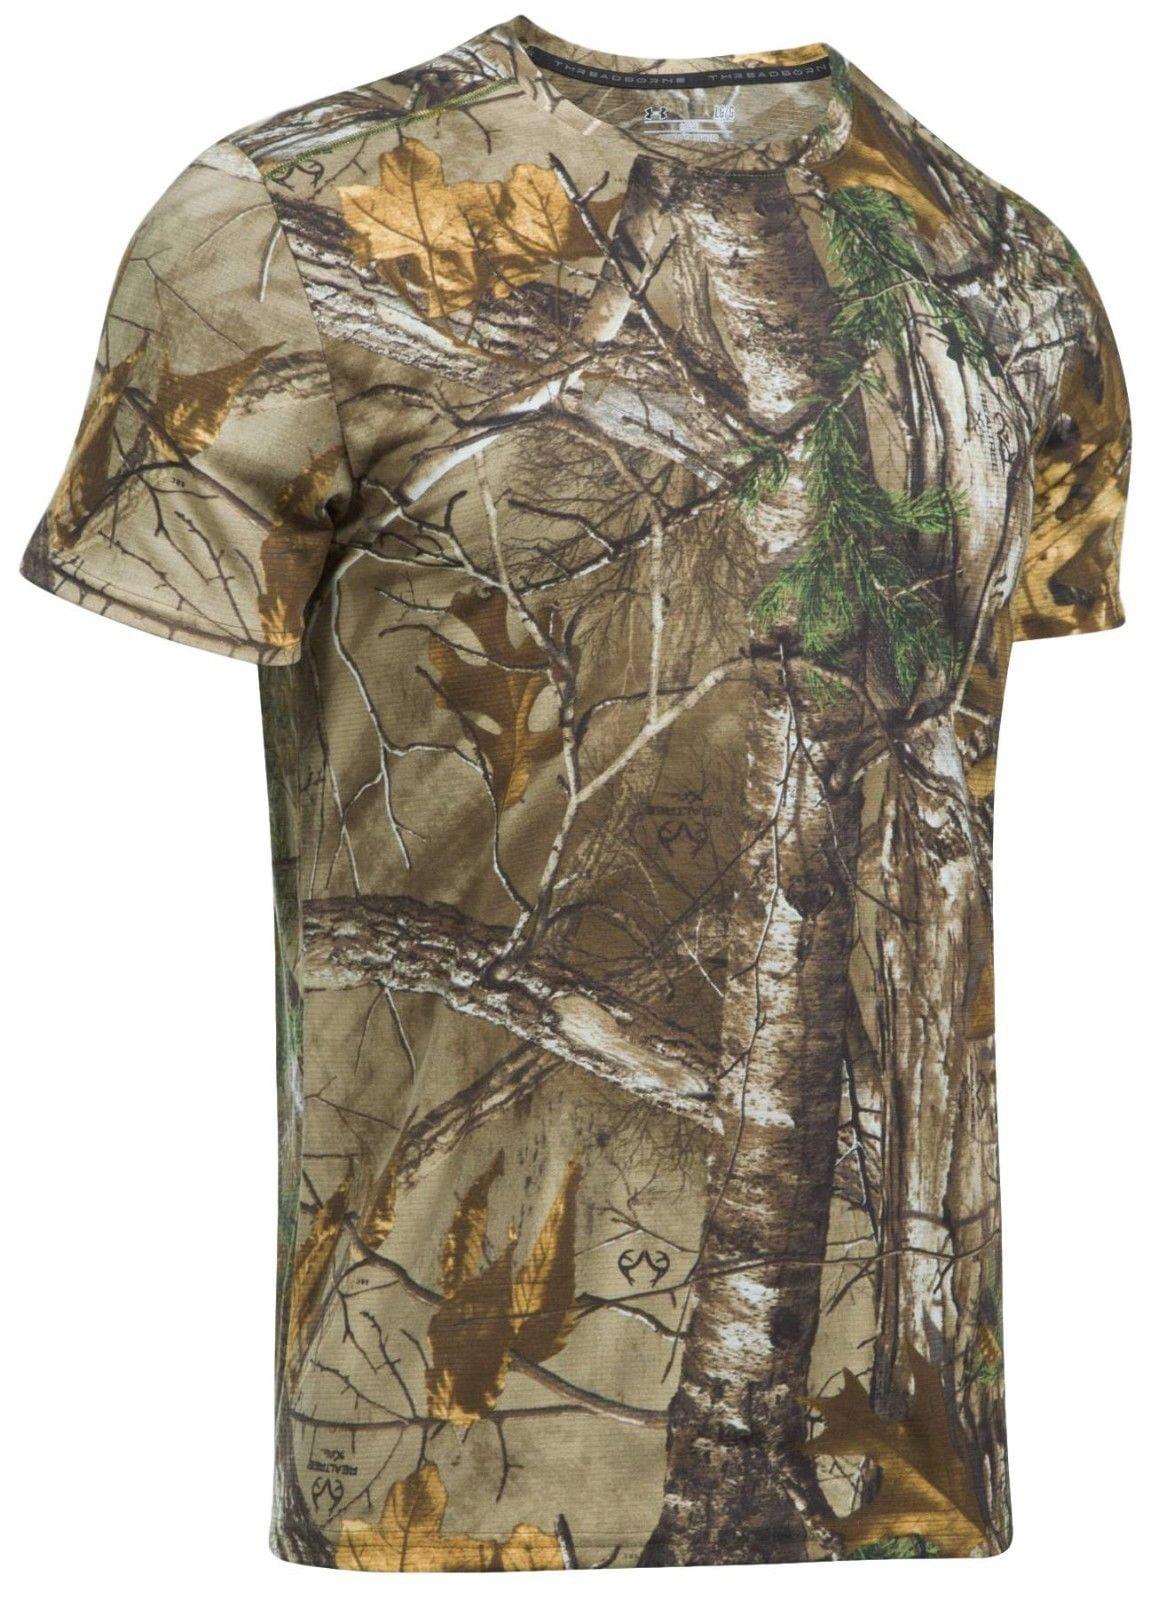 Under Armour Men's UA Threadborne Early Season Short Sleeve Camo Shirt